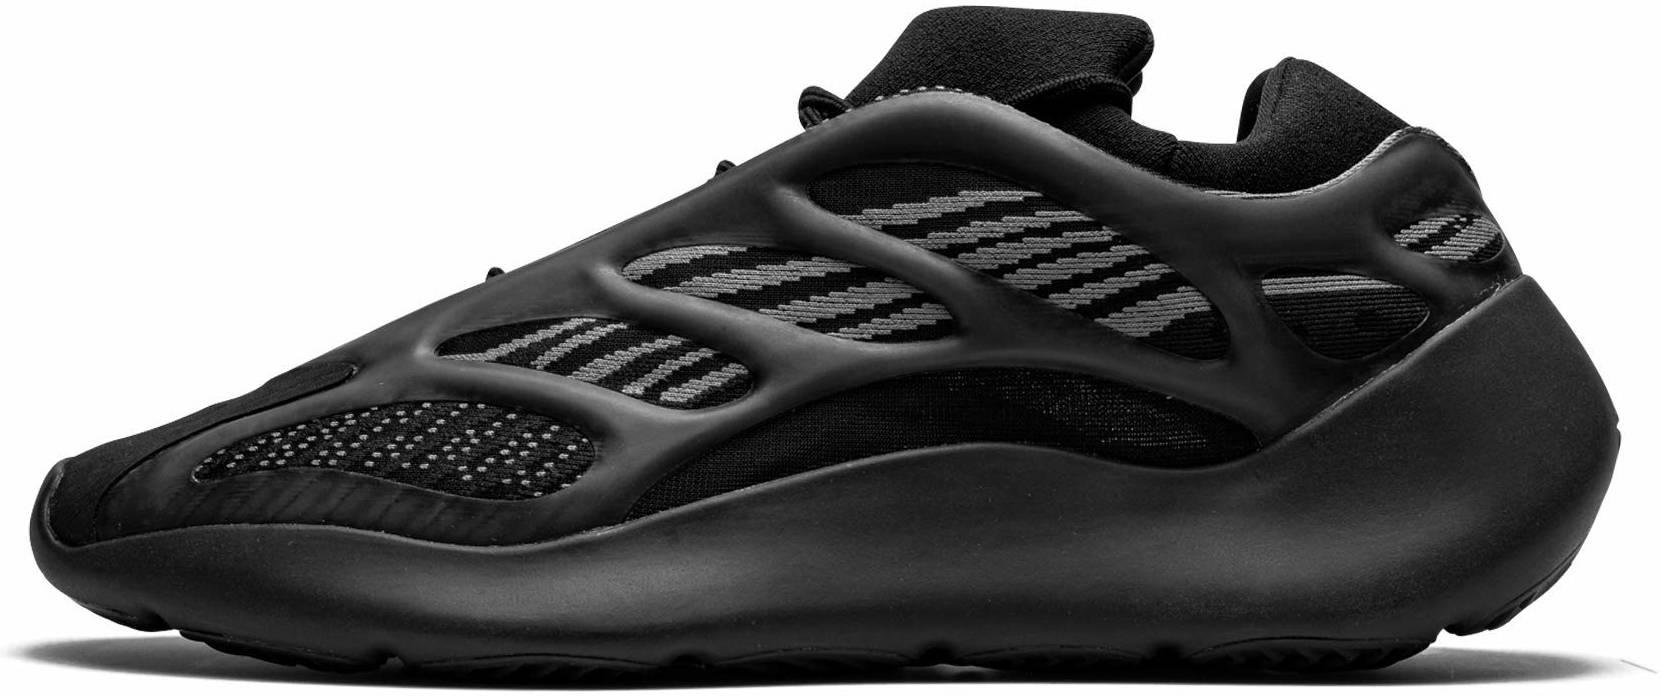 Adidas Yeezy 700 v3 sneakers in 3 colors | RunRepeat